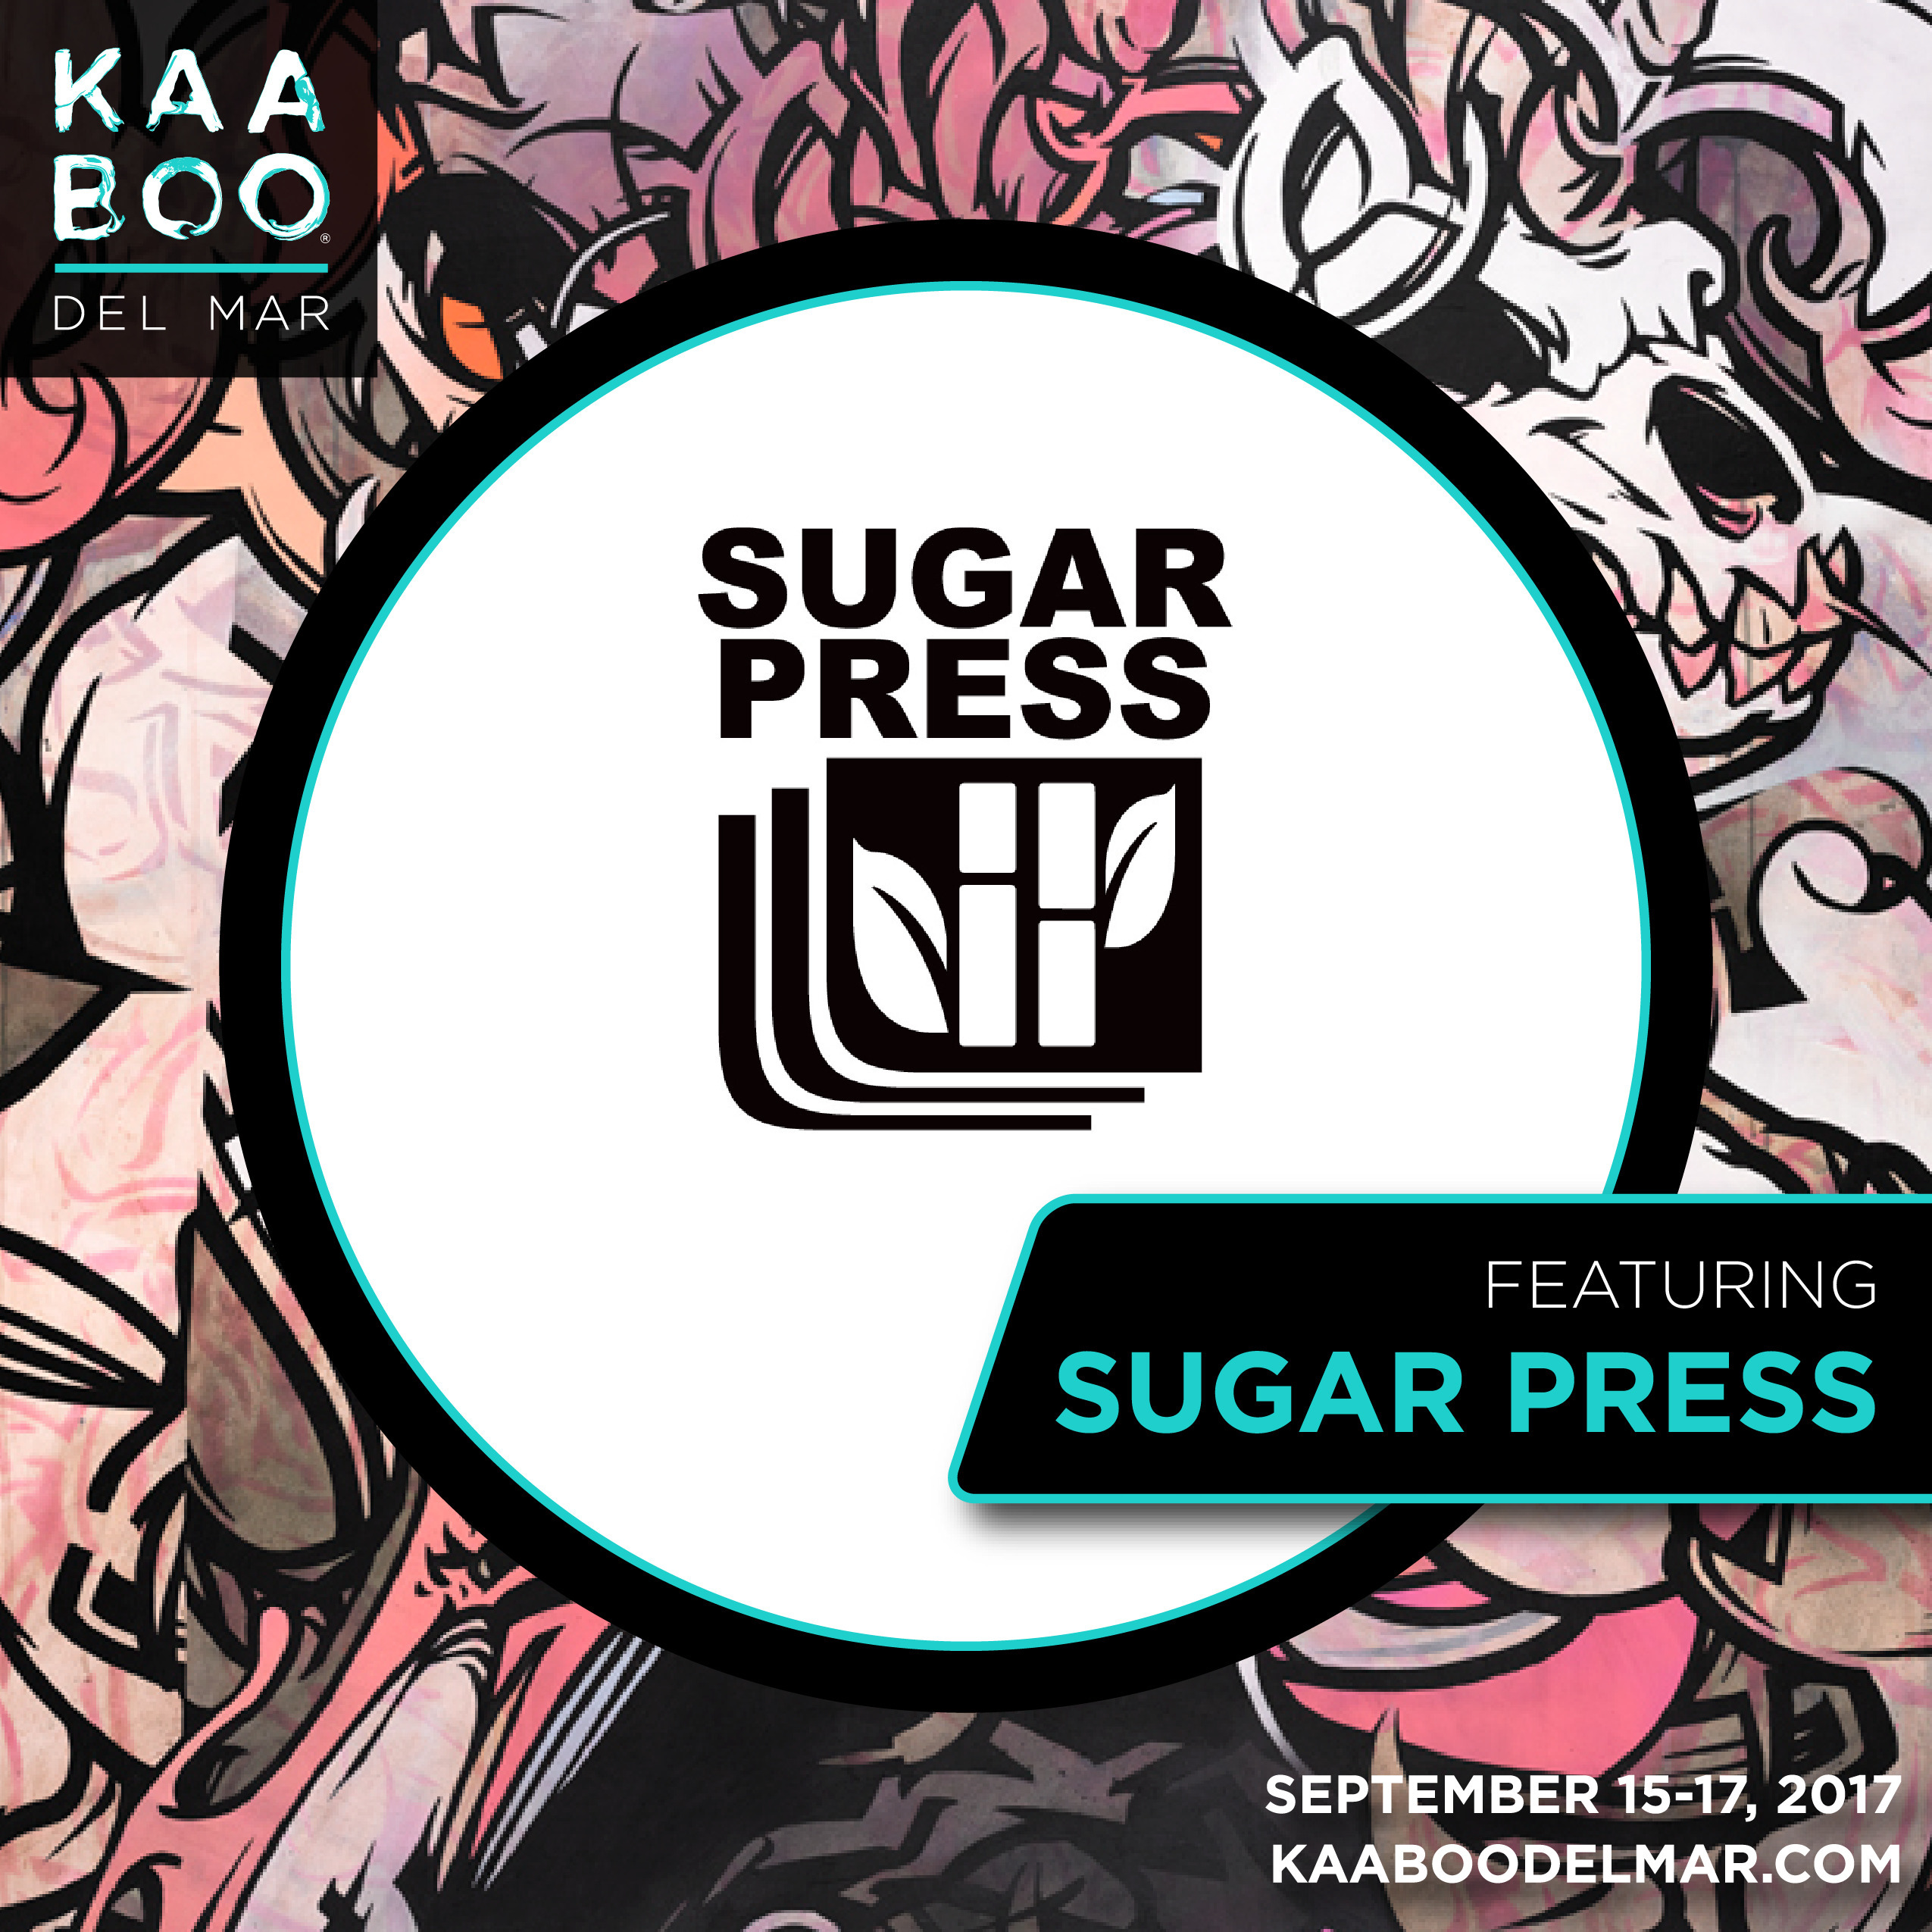 Excited announce Gallery Space  - sugarpressart | ello